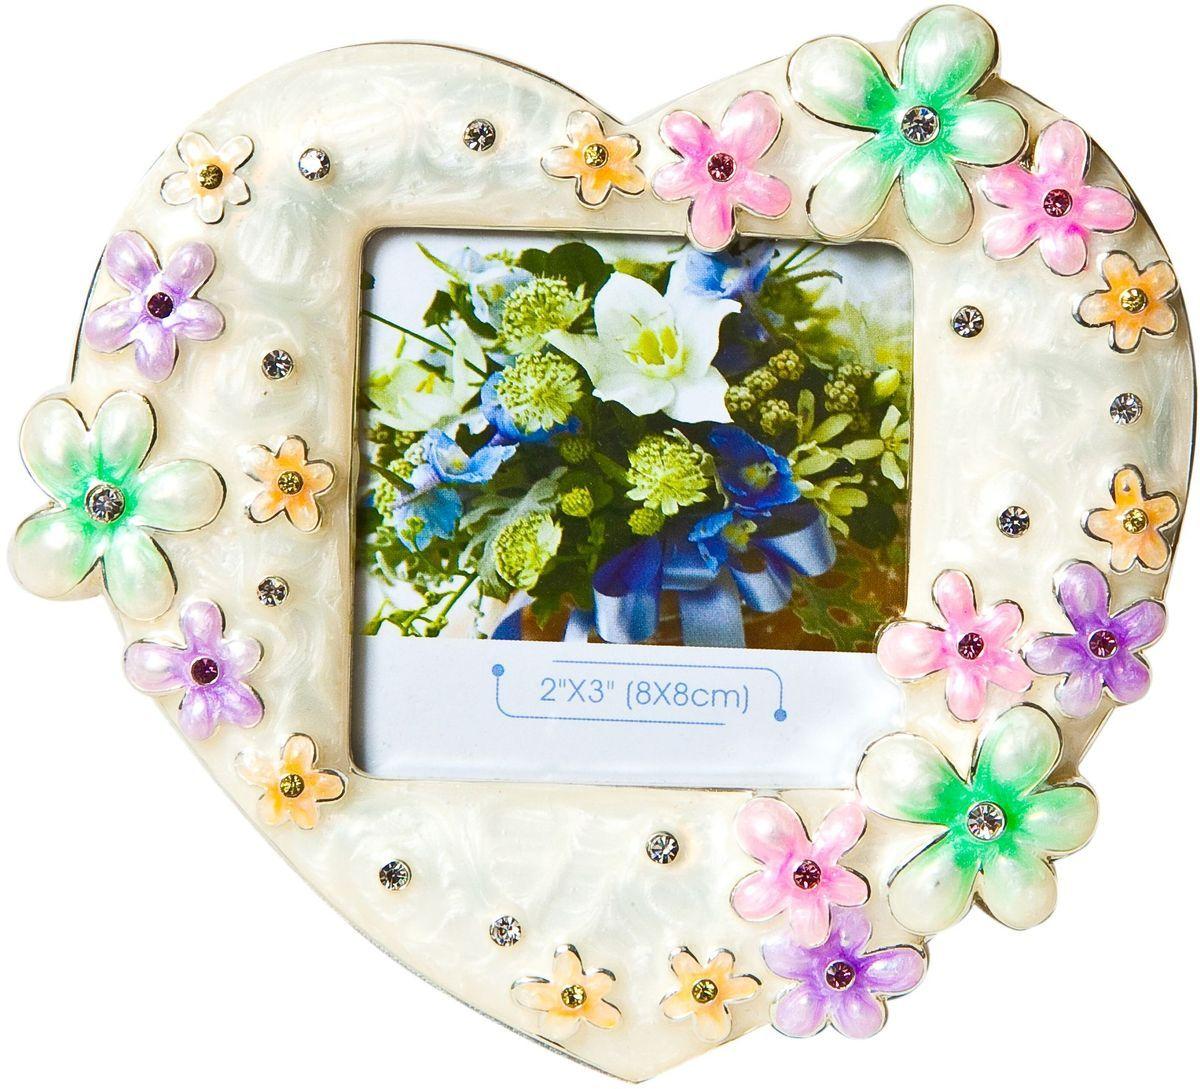 Фоторамка-мини декоративная Platinum Цветы, 8 х 8 см. PF3274N-3PLATINUM PF3274N-3